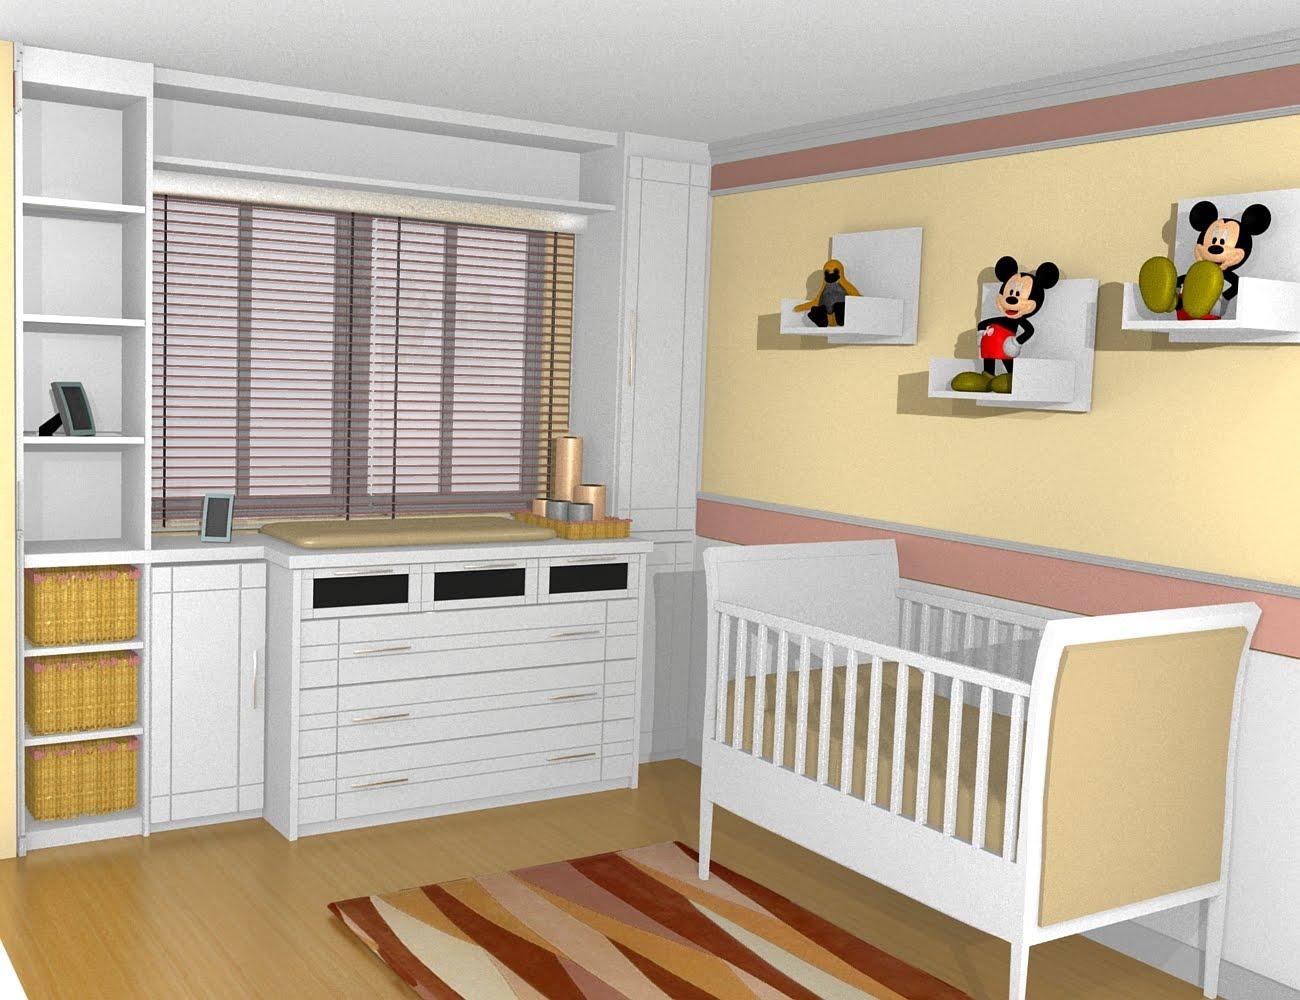 M veis planejados para quarto de beb decorando casas - Armarios de bebe ...